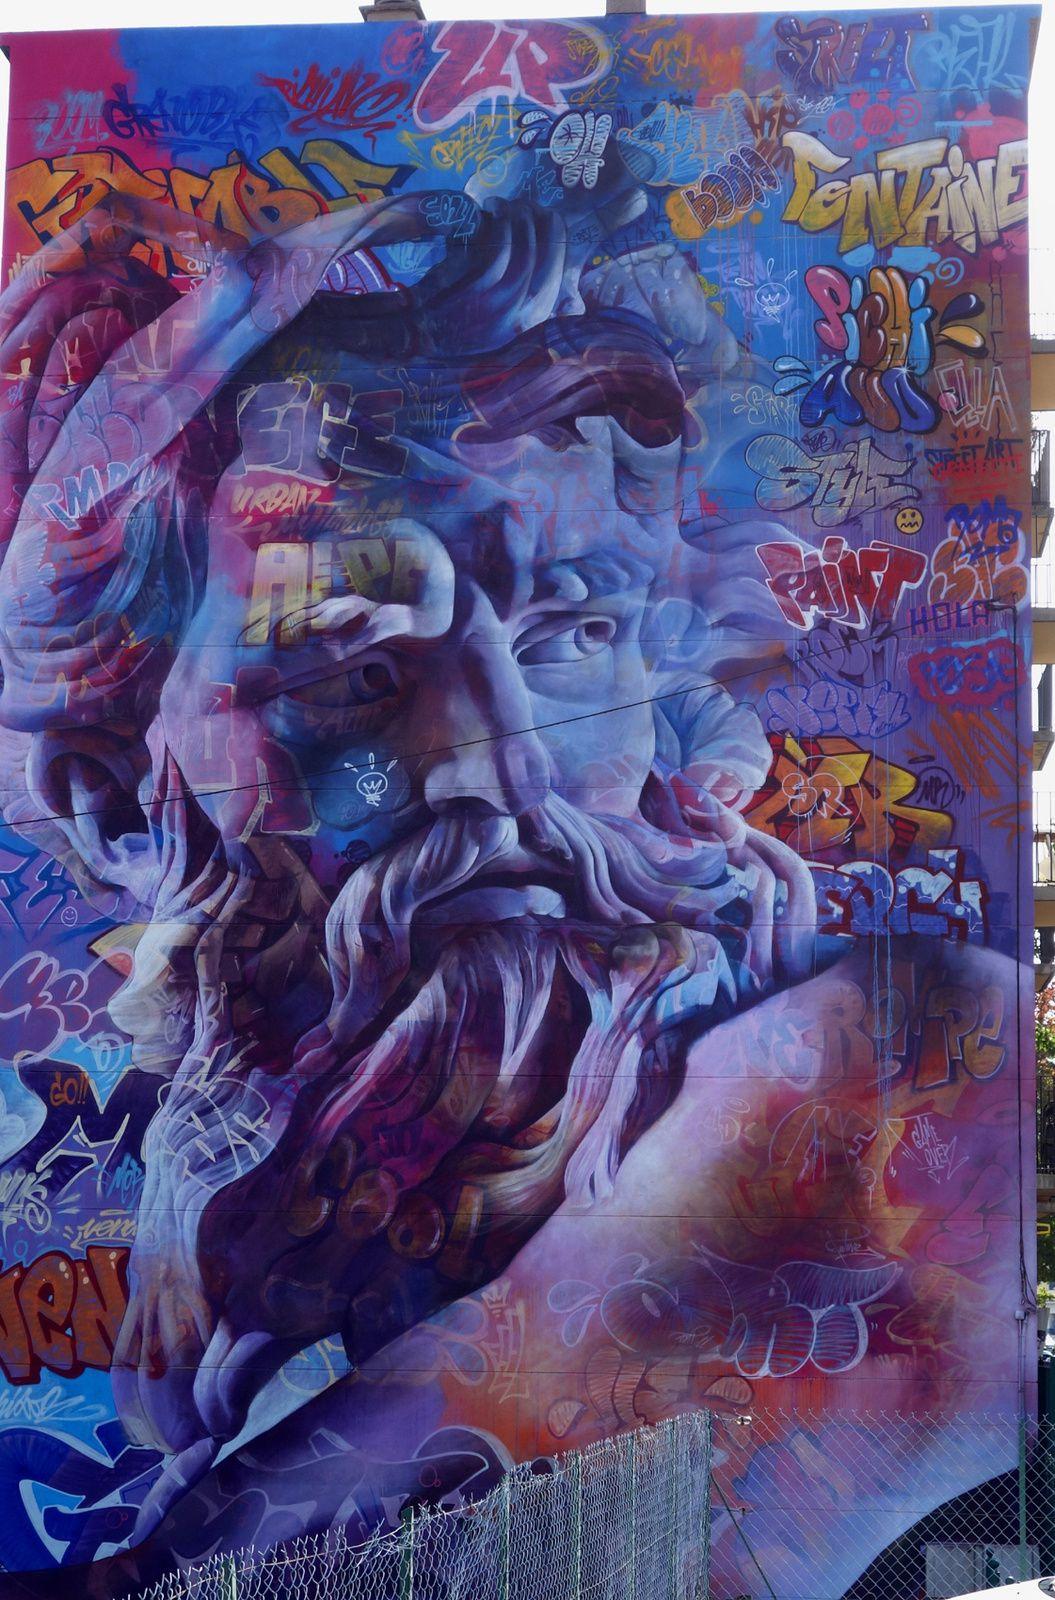 Street Art : Graffitis & Fresques Murales 38169 Fontaine